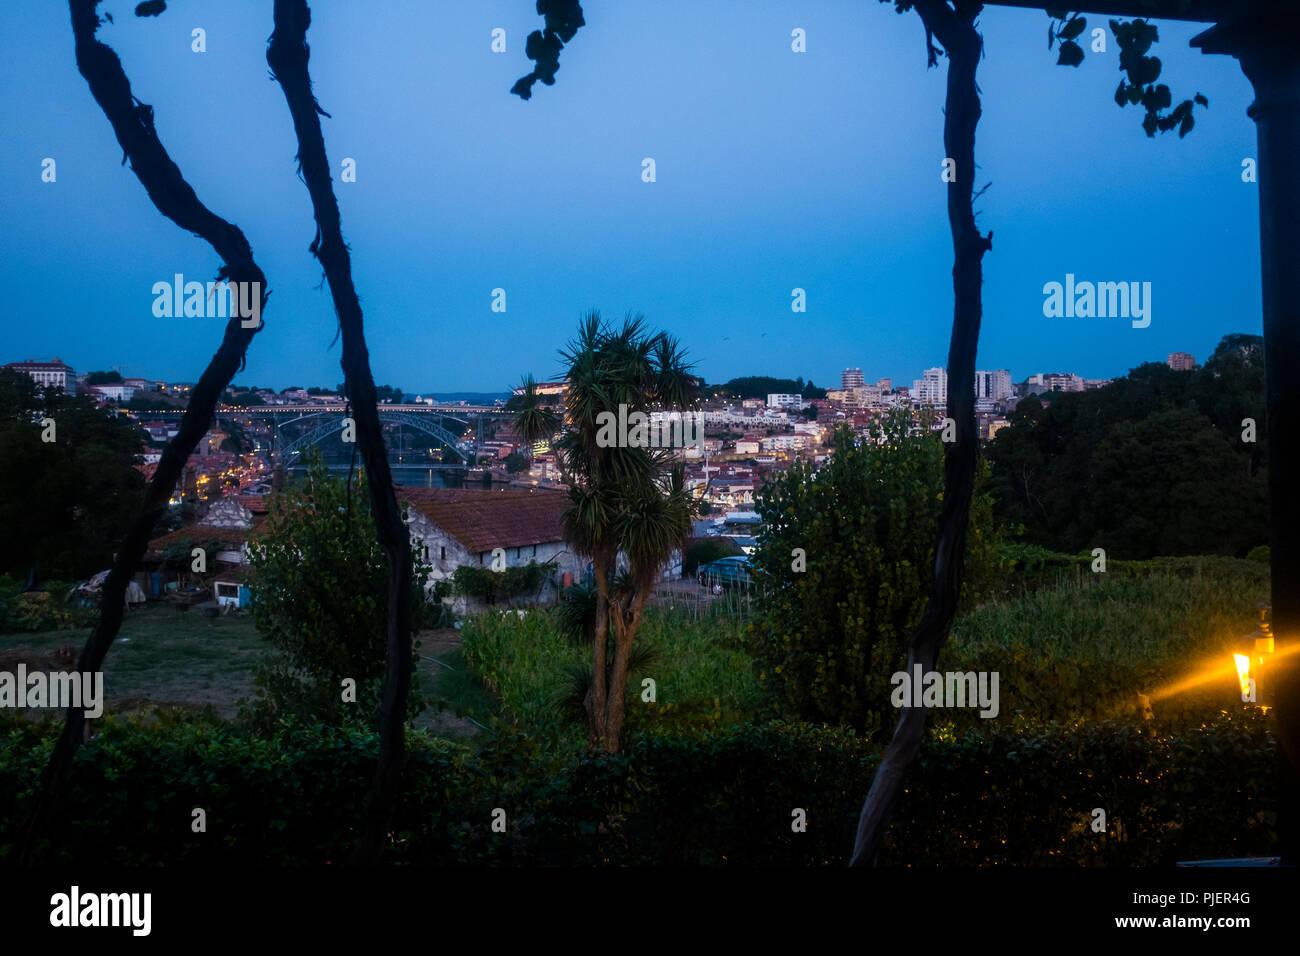 View from Vinum, the restaurant and wine bar at Graham's Port Lodge, Vila Nova de Gaia, Porto, Portugal. Stock Photo